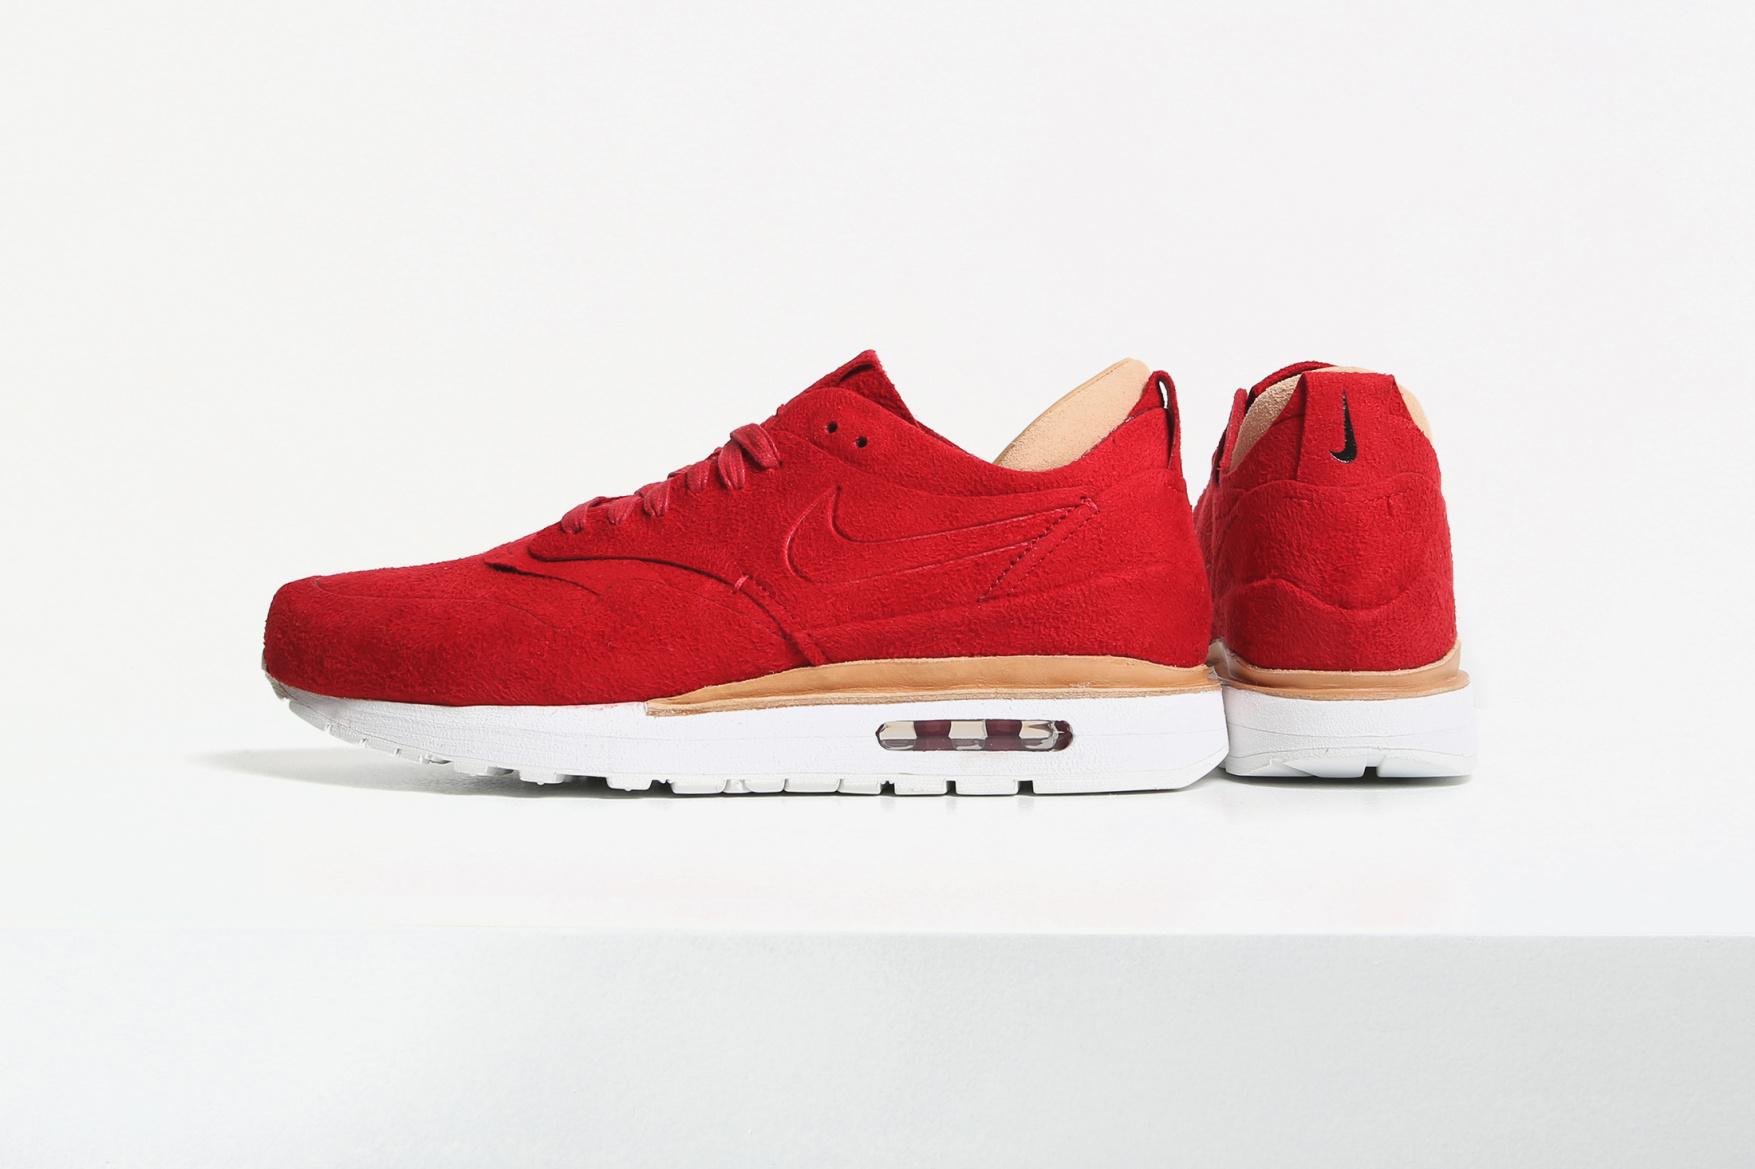 Nike Air Max 1 Royal